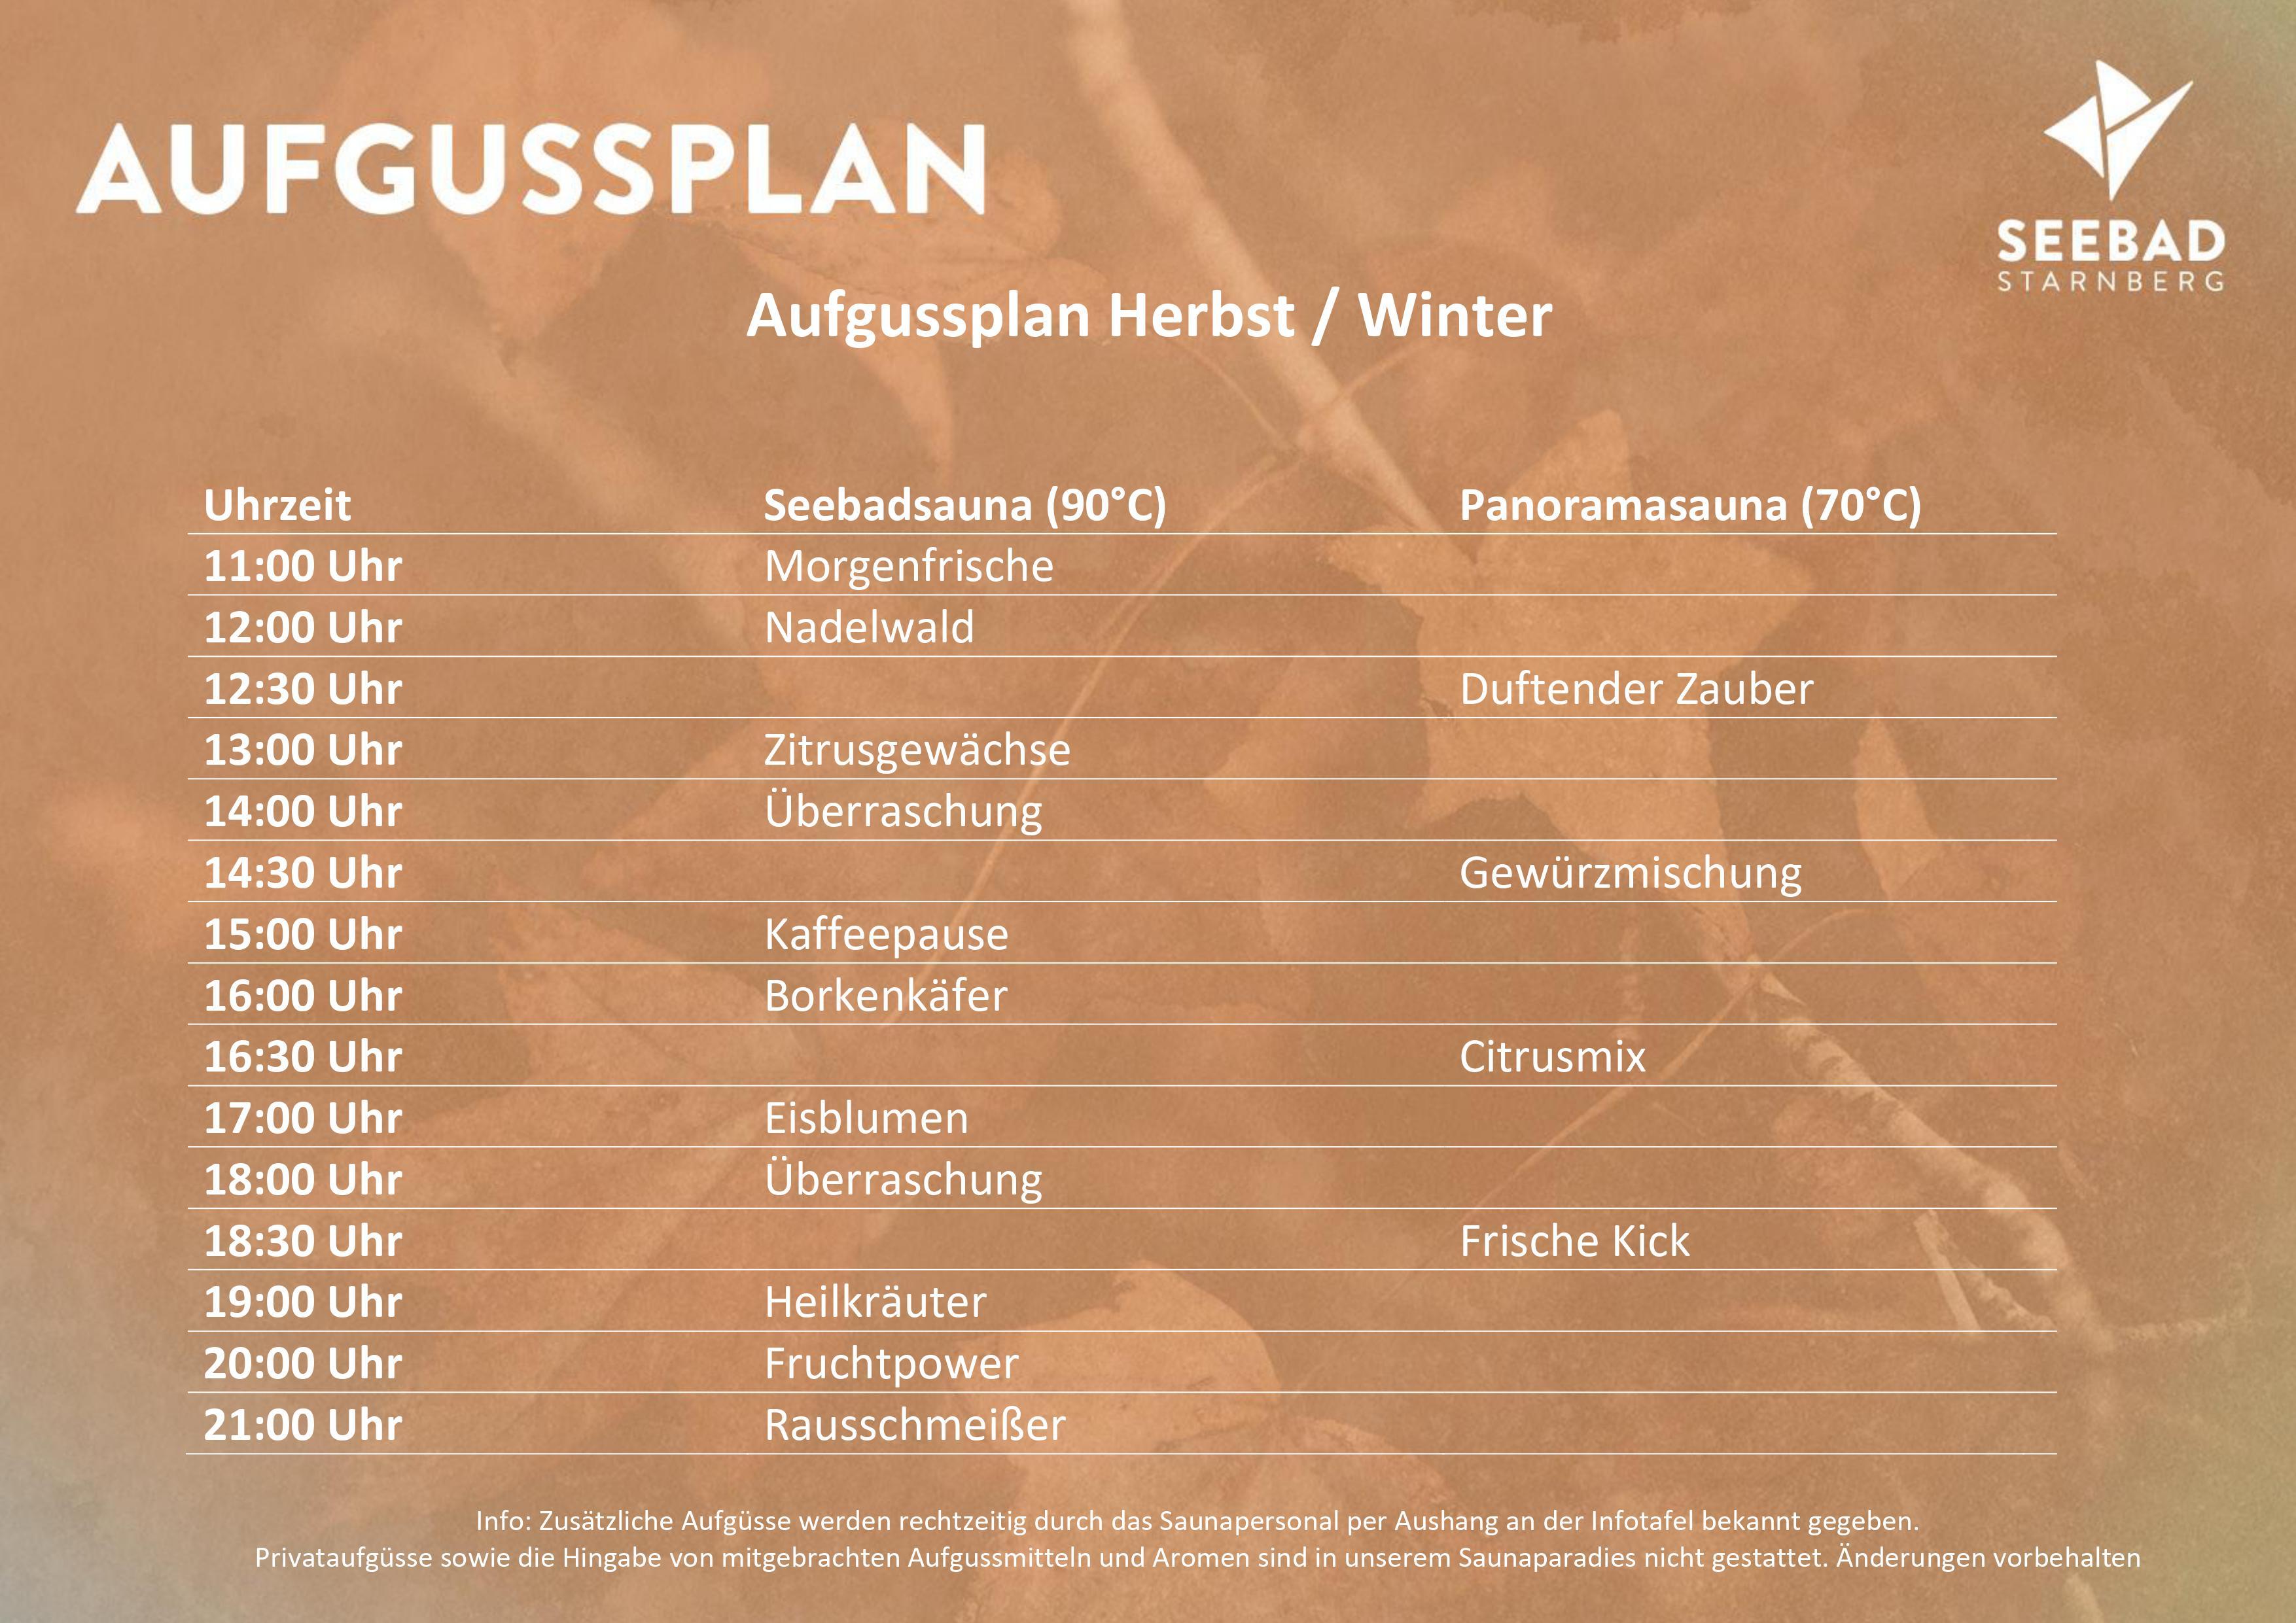 Aufgussplan Herbst Winter 2020